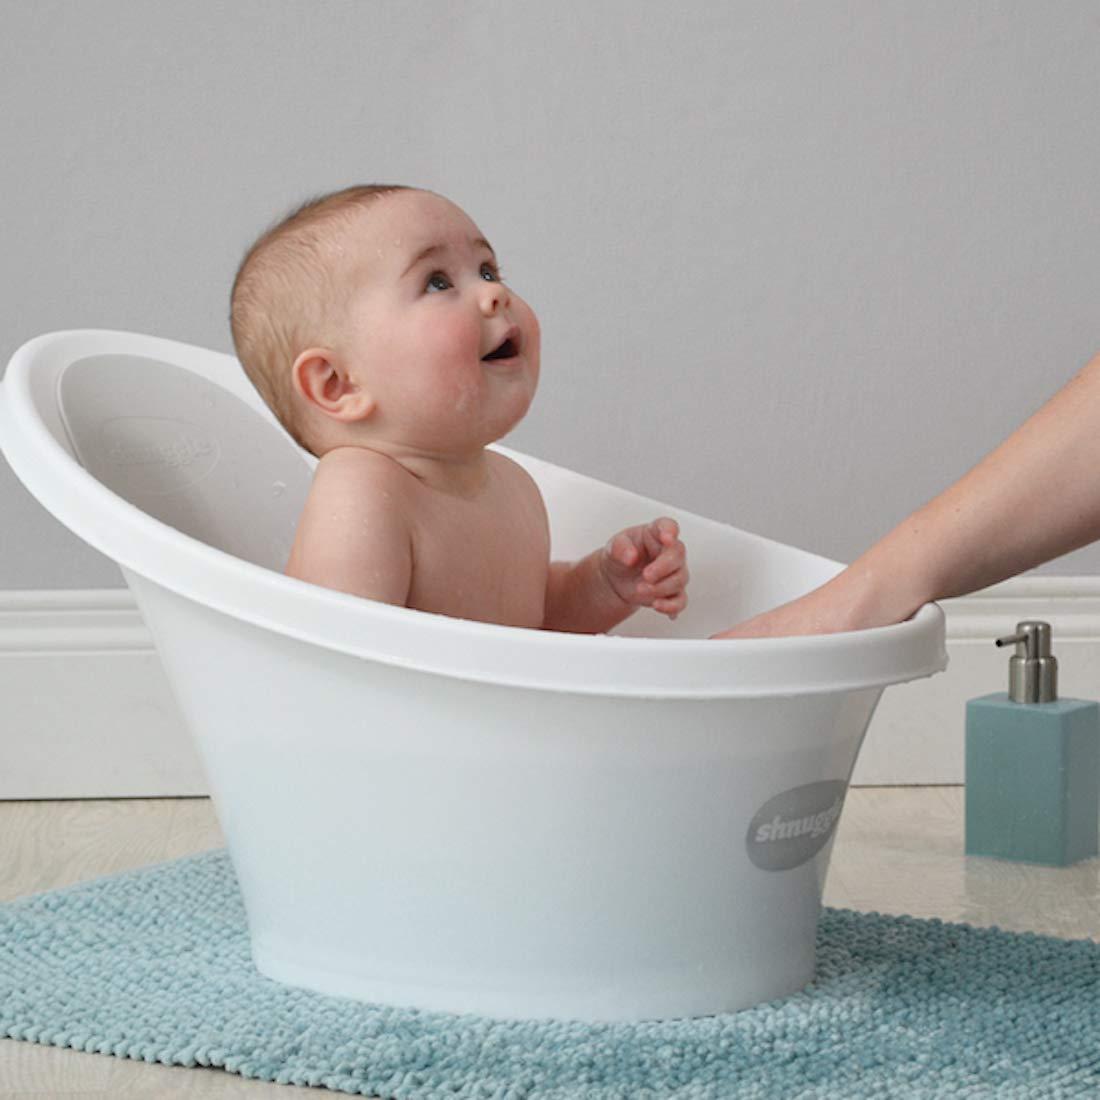 5. Shnuggle Baby Bathtub: Best Compact Support Seat for Newborns